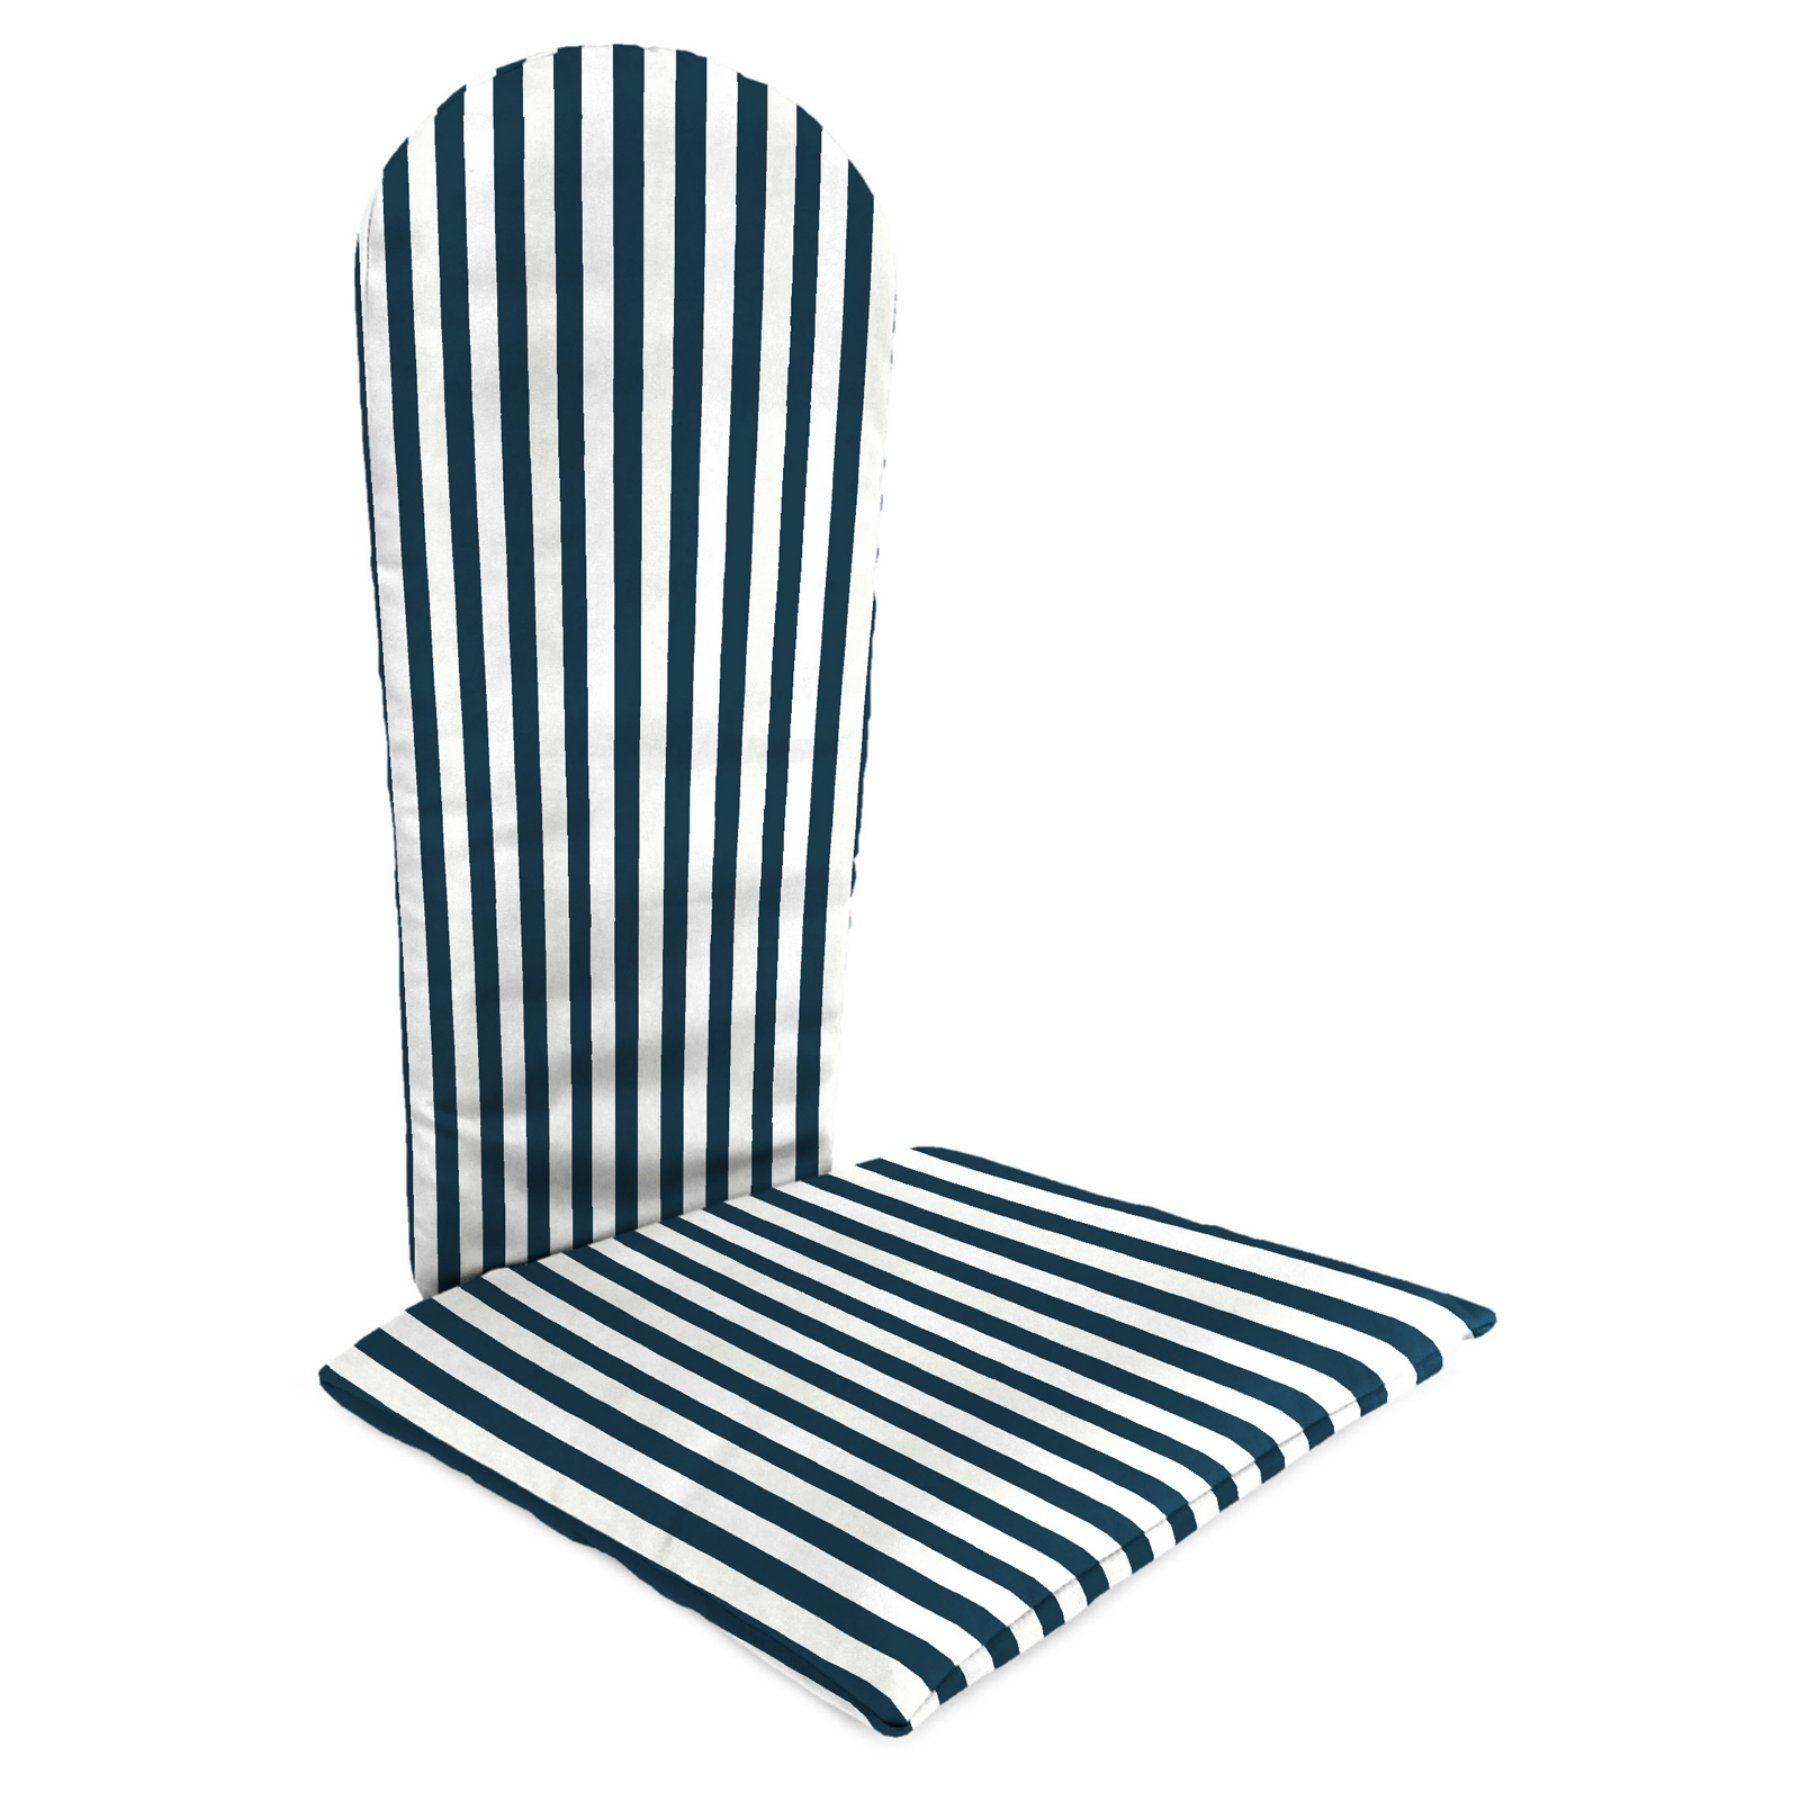 jordan knife edge outdoor adirondack chair cushion stripe oxford